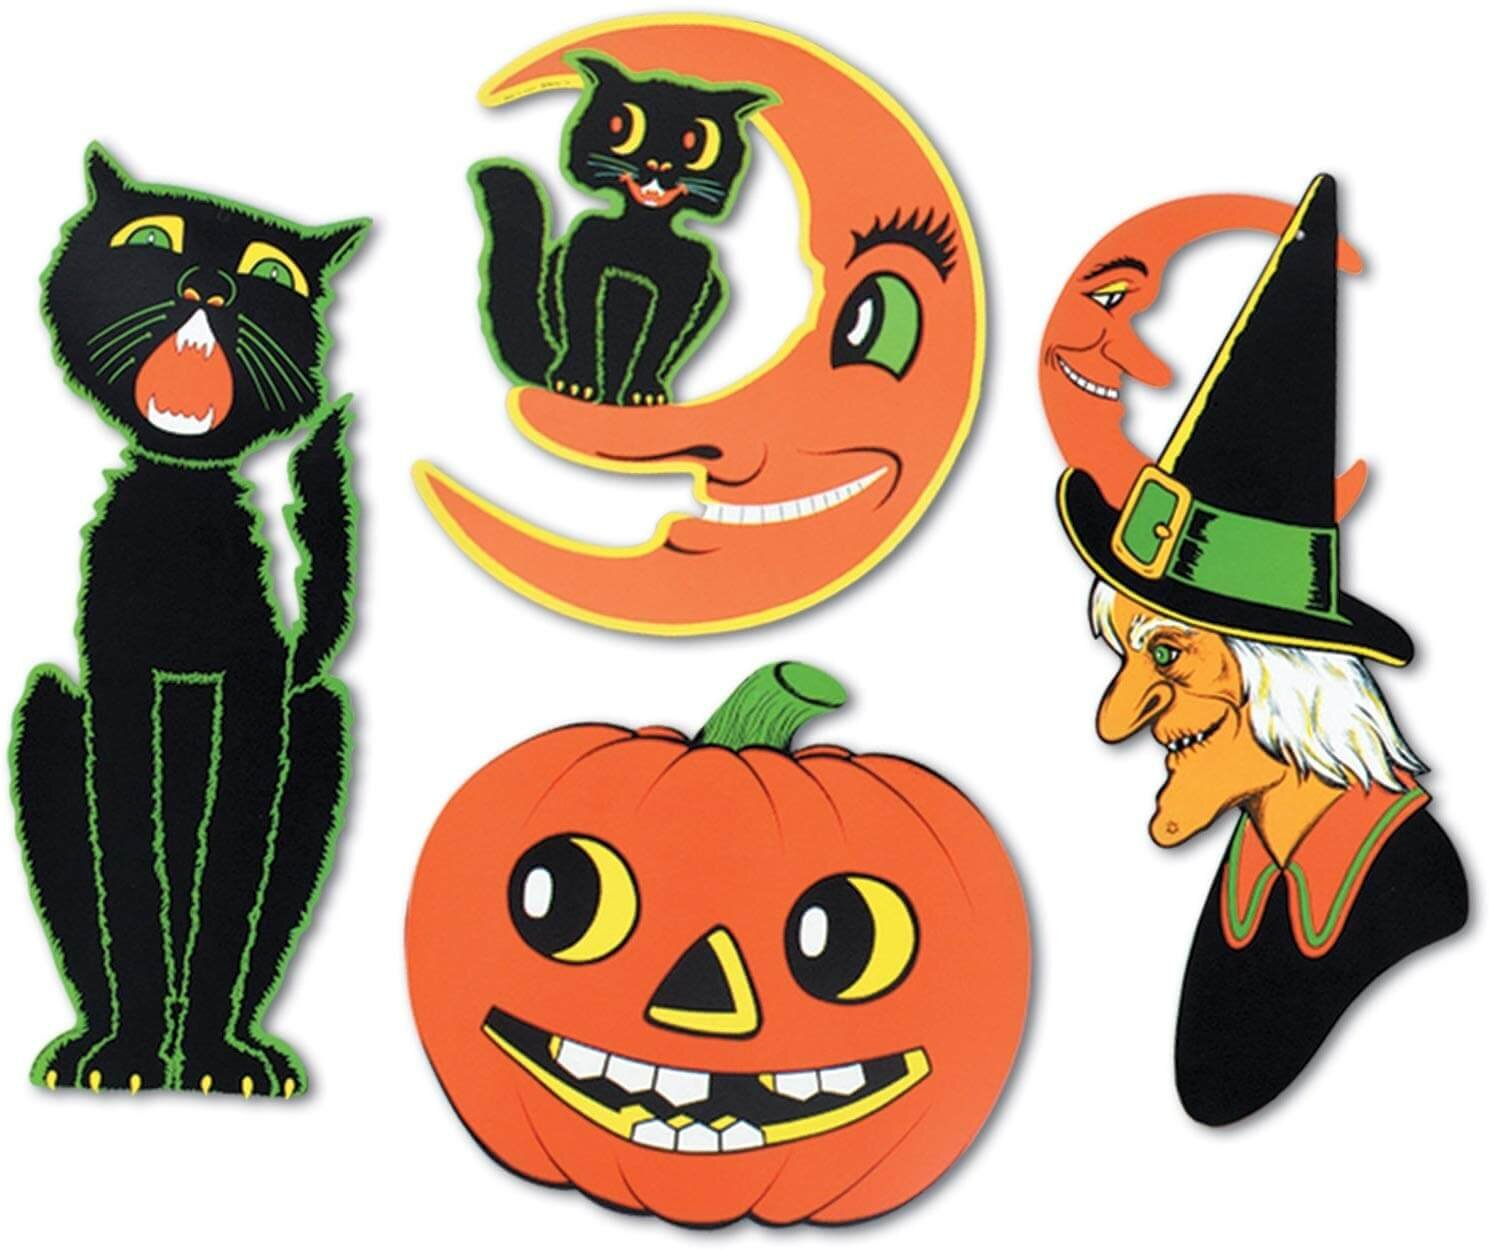 Beistle Company Vintage Halloween Decorations